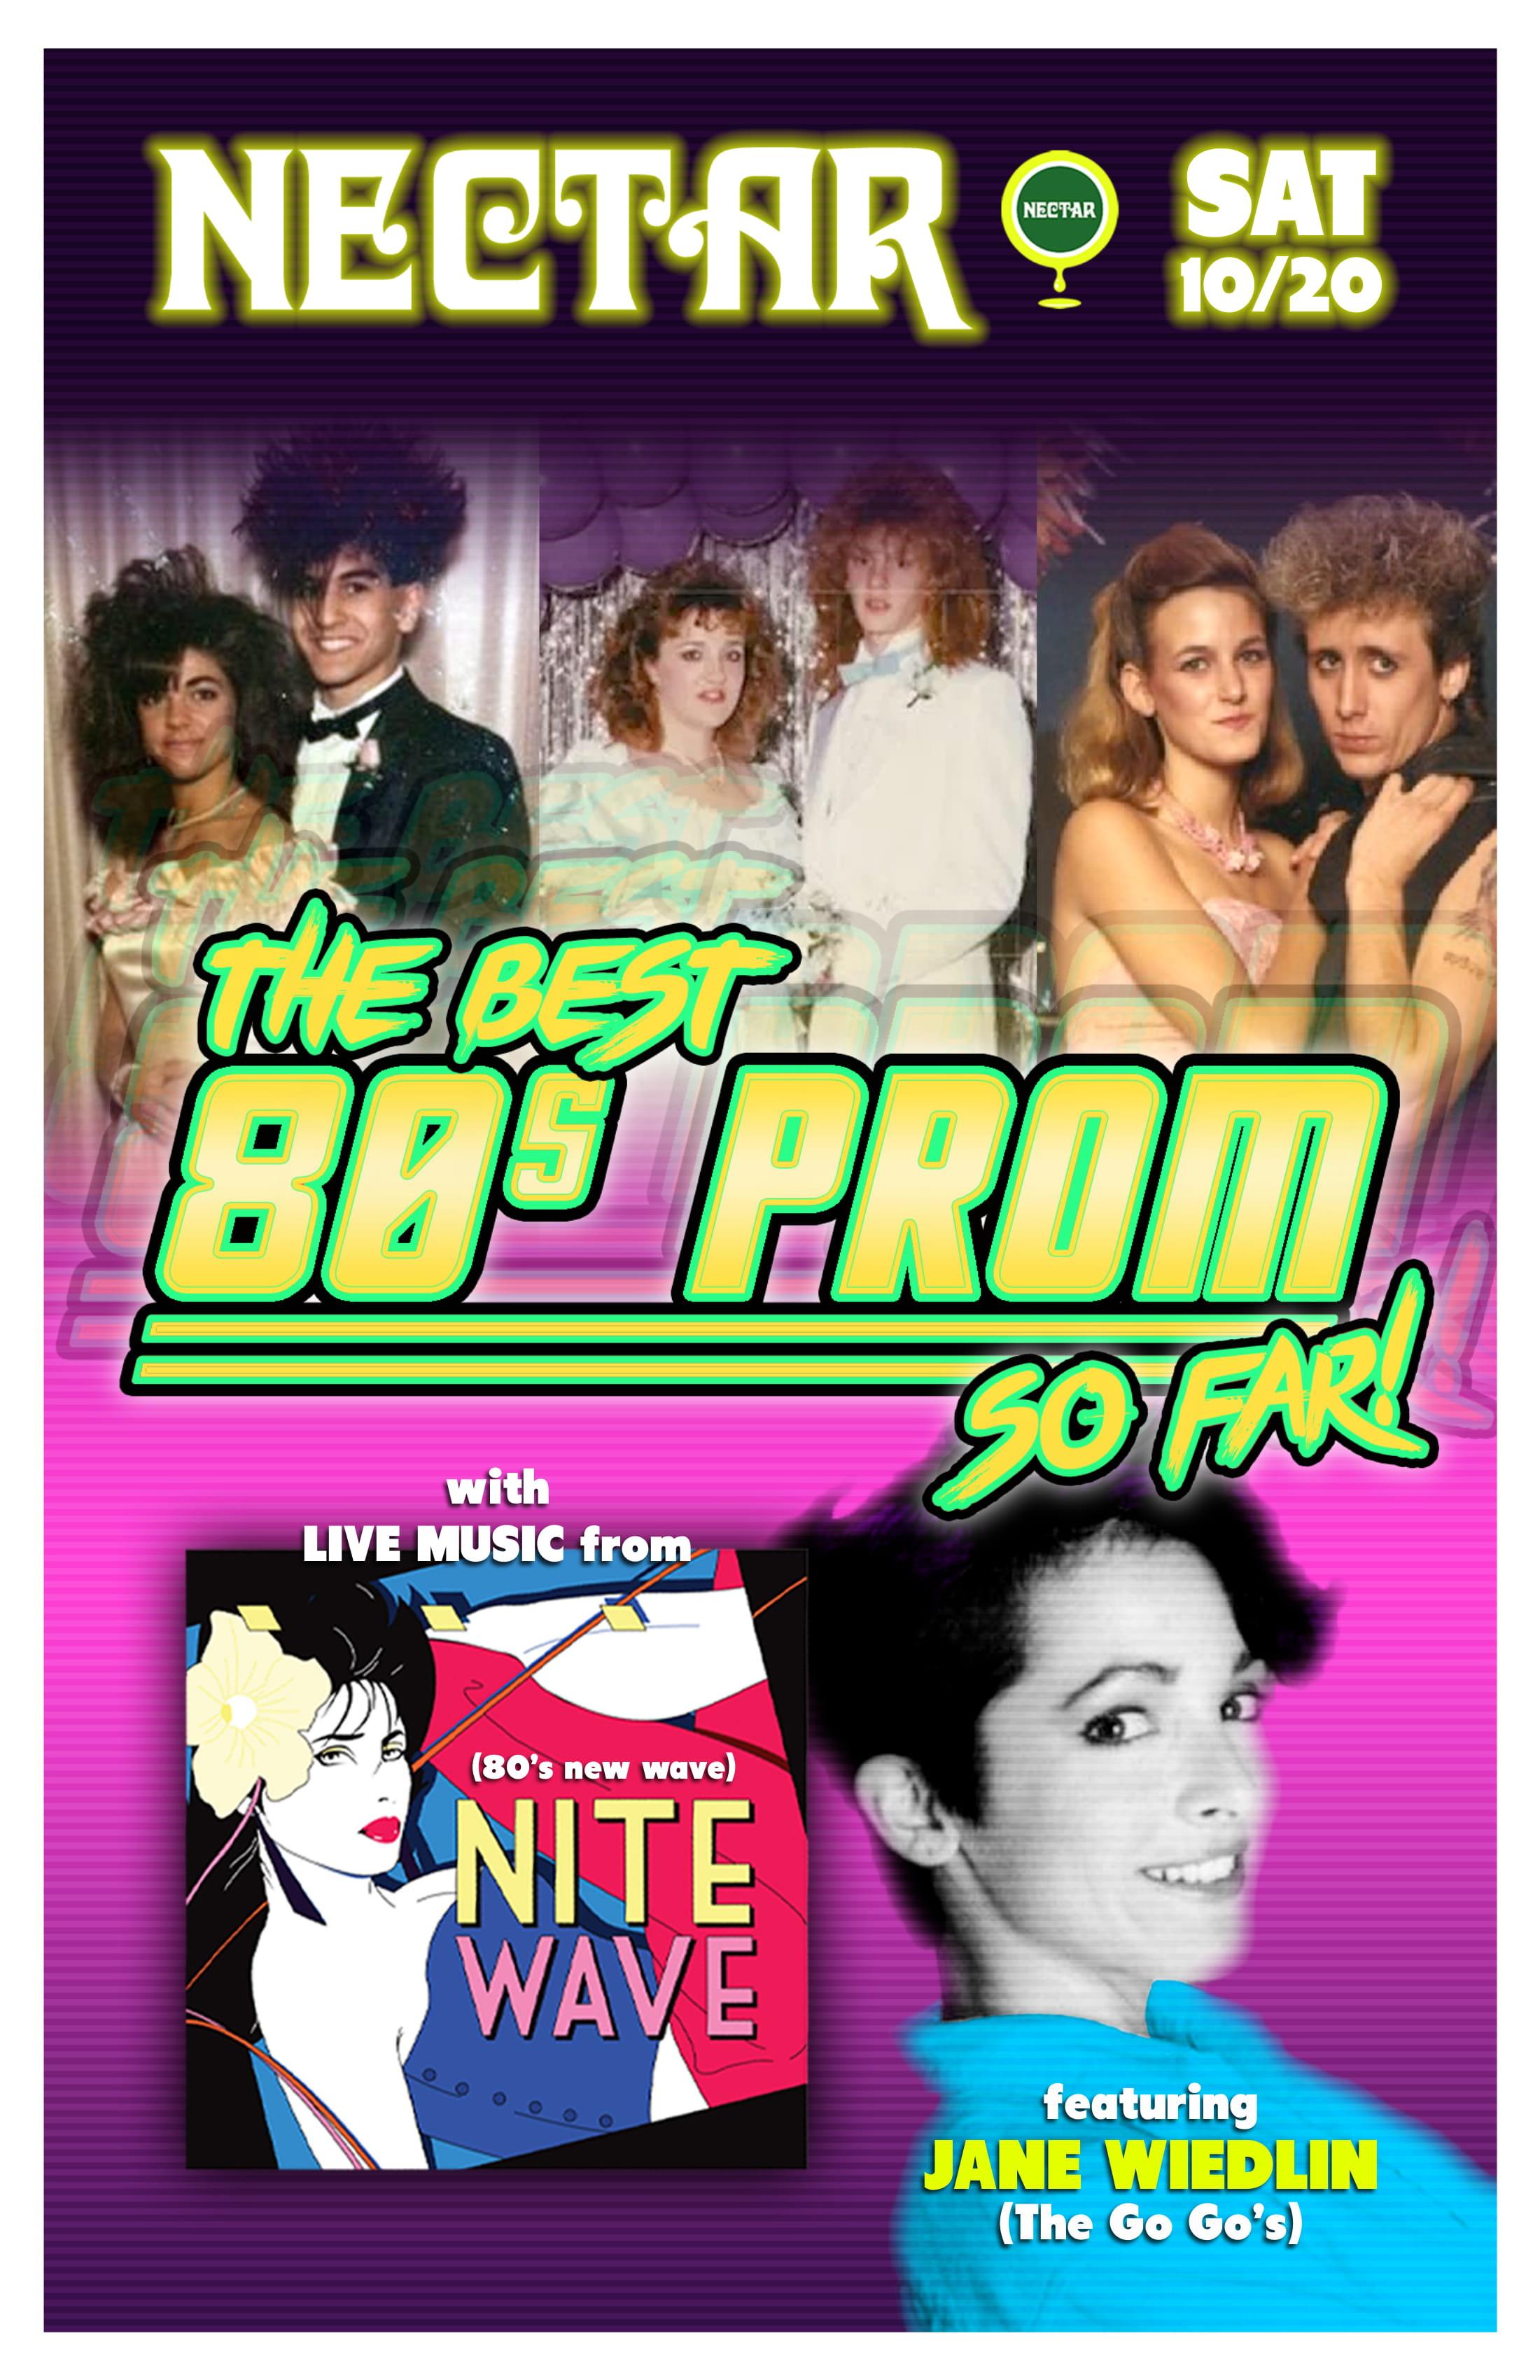 80s Prom 102018 poster2b-1.jpg